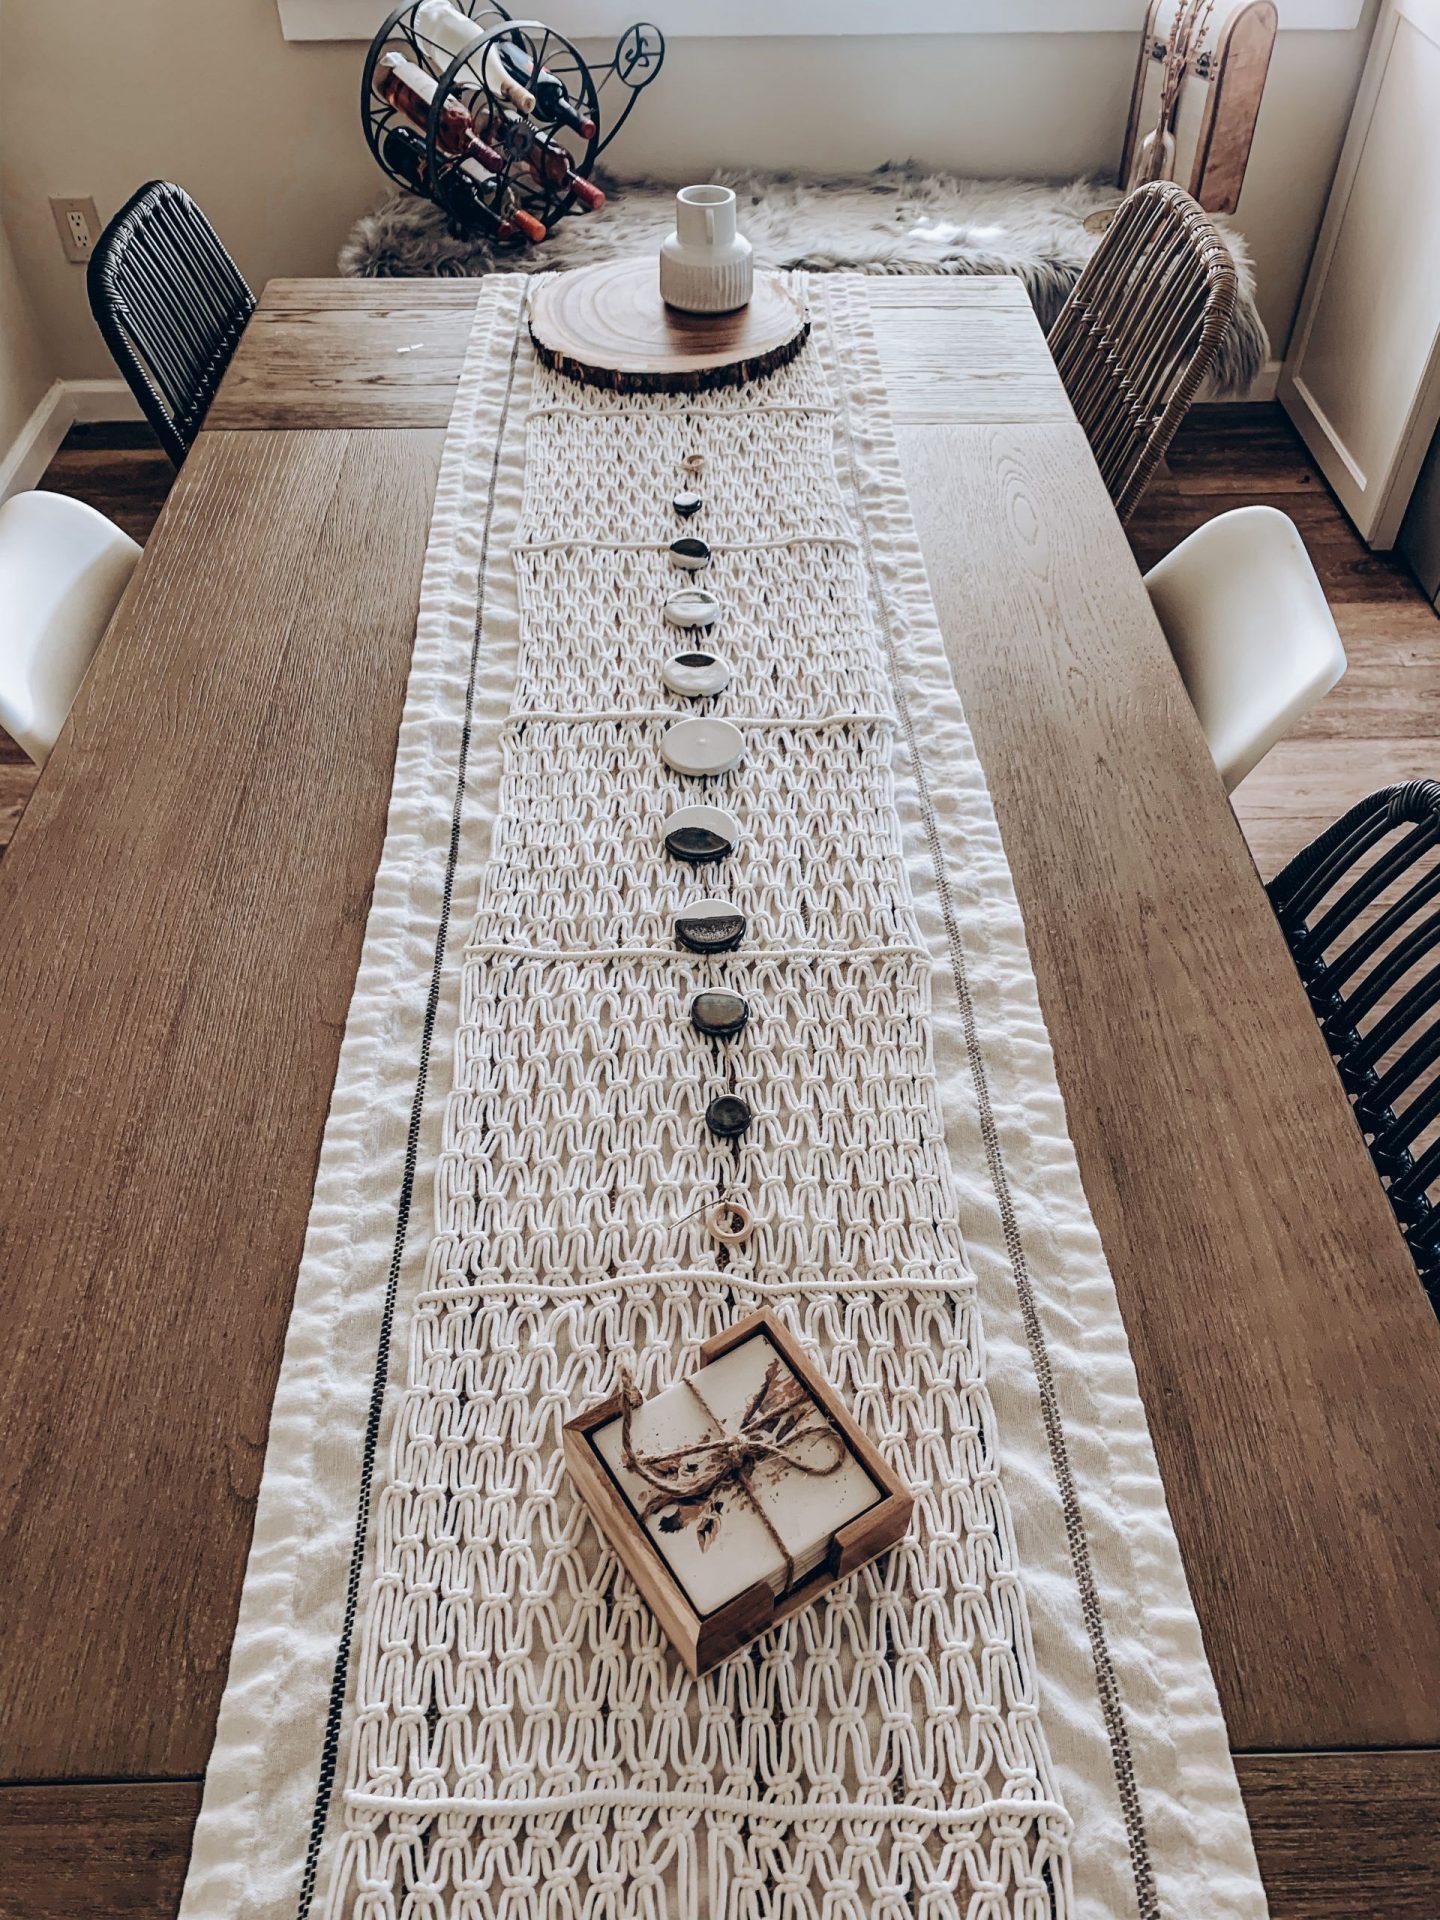 Trendy Homes Kitchen Inspiration